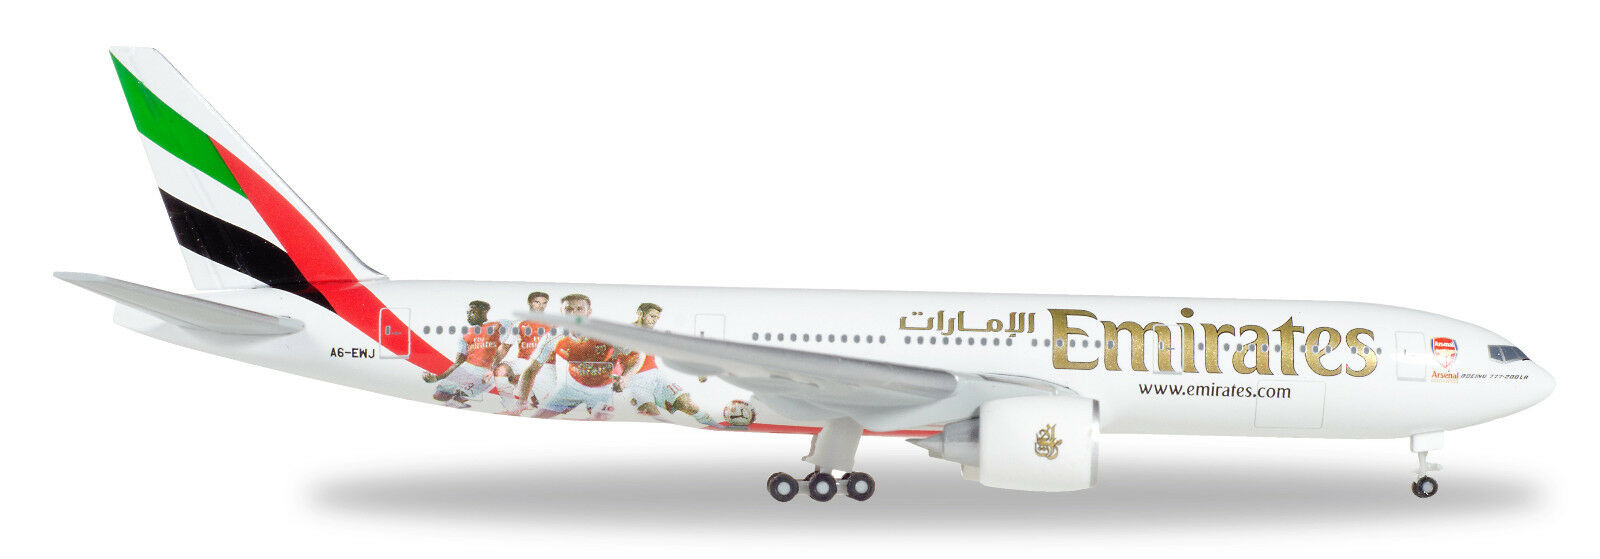 Herpa 529235 boeing 777-200lr emirates reg.a6-ewj 1  500.